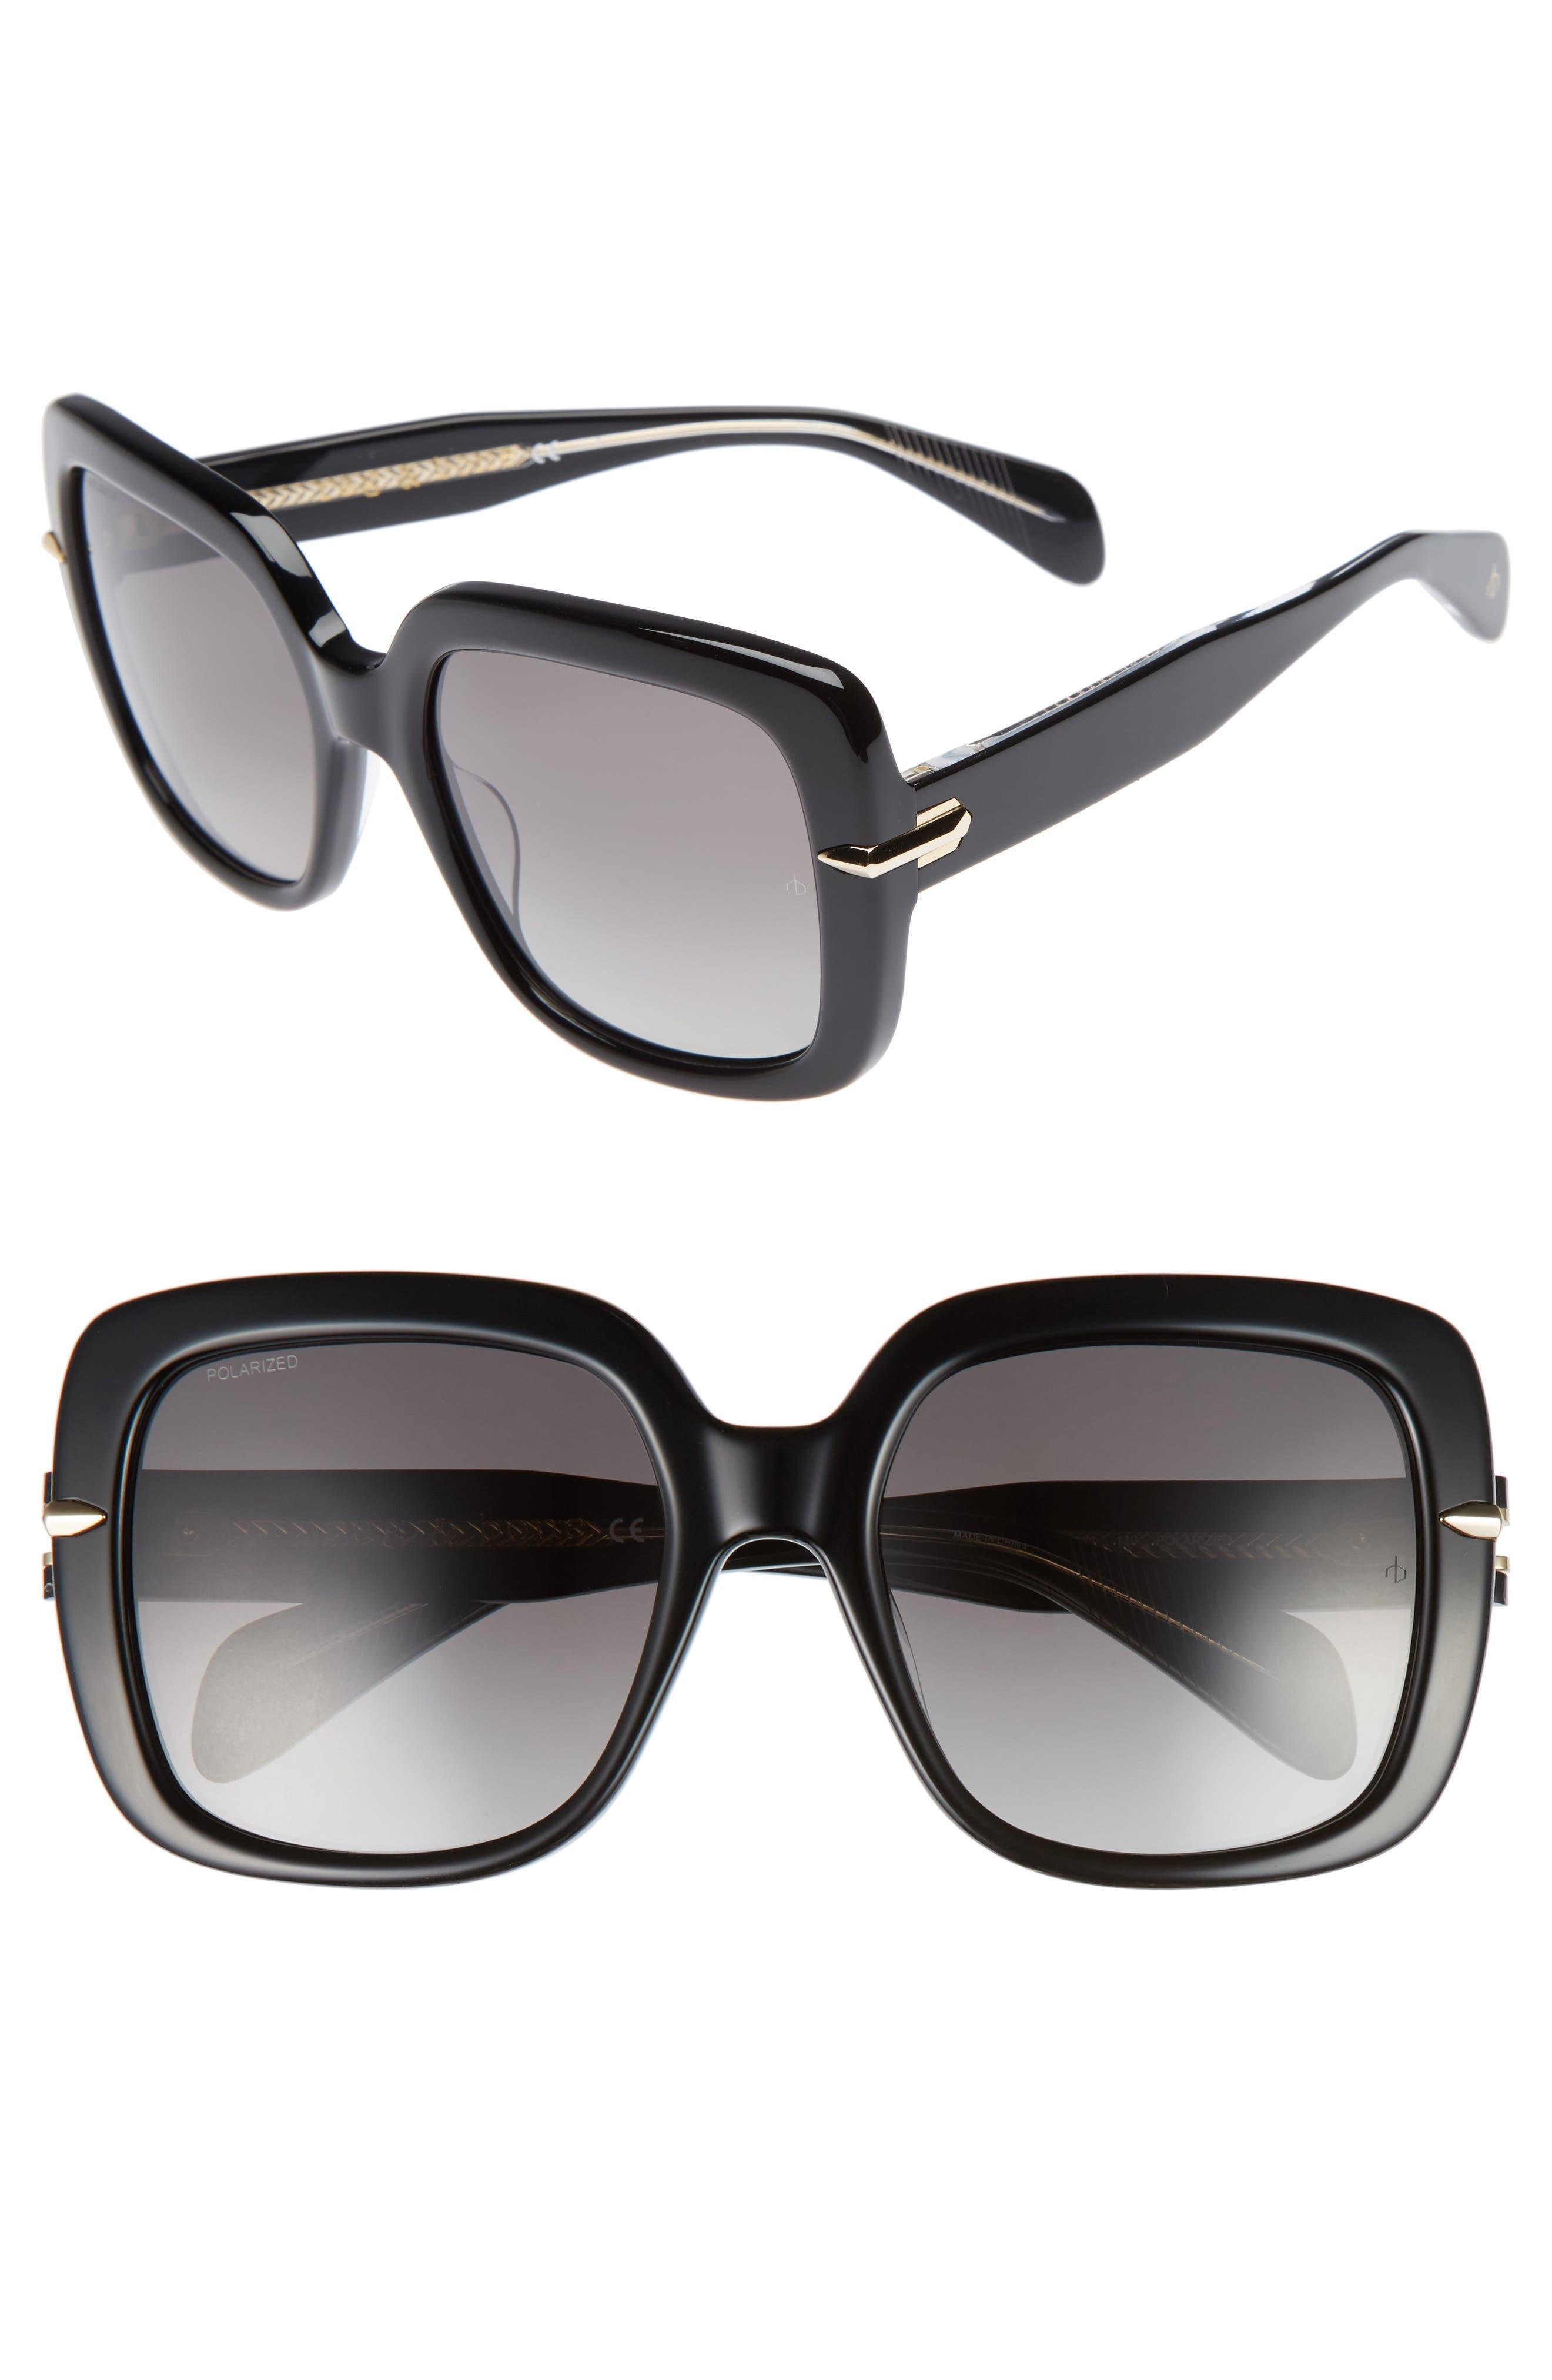 56mm Square Polarized Sunglasses,                         Main,                         color, 001